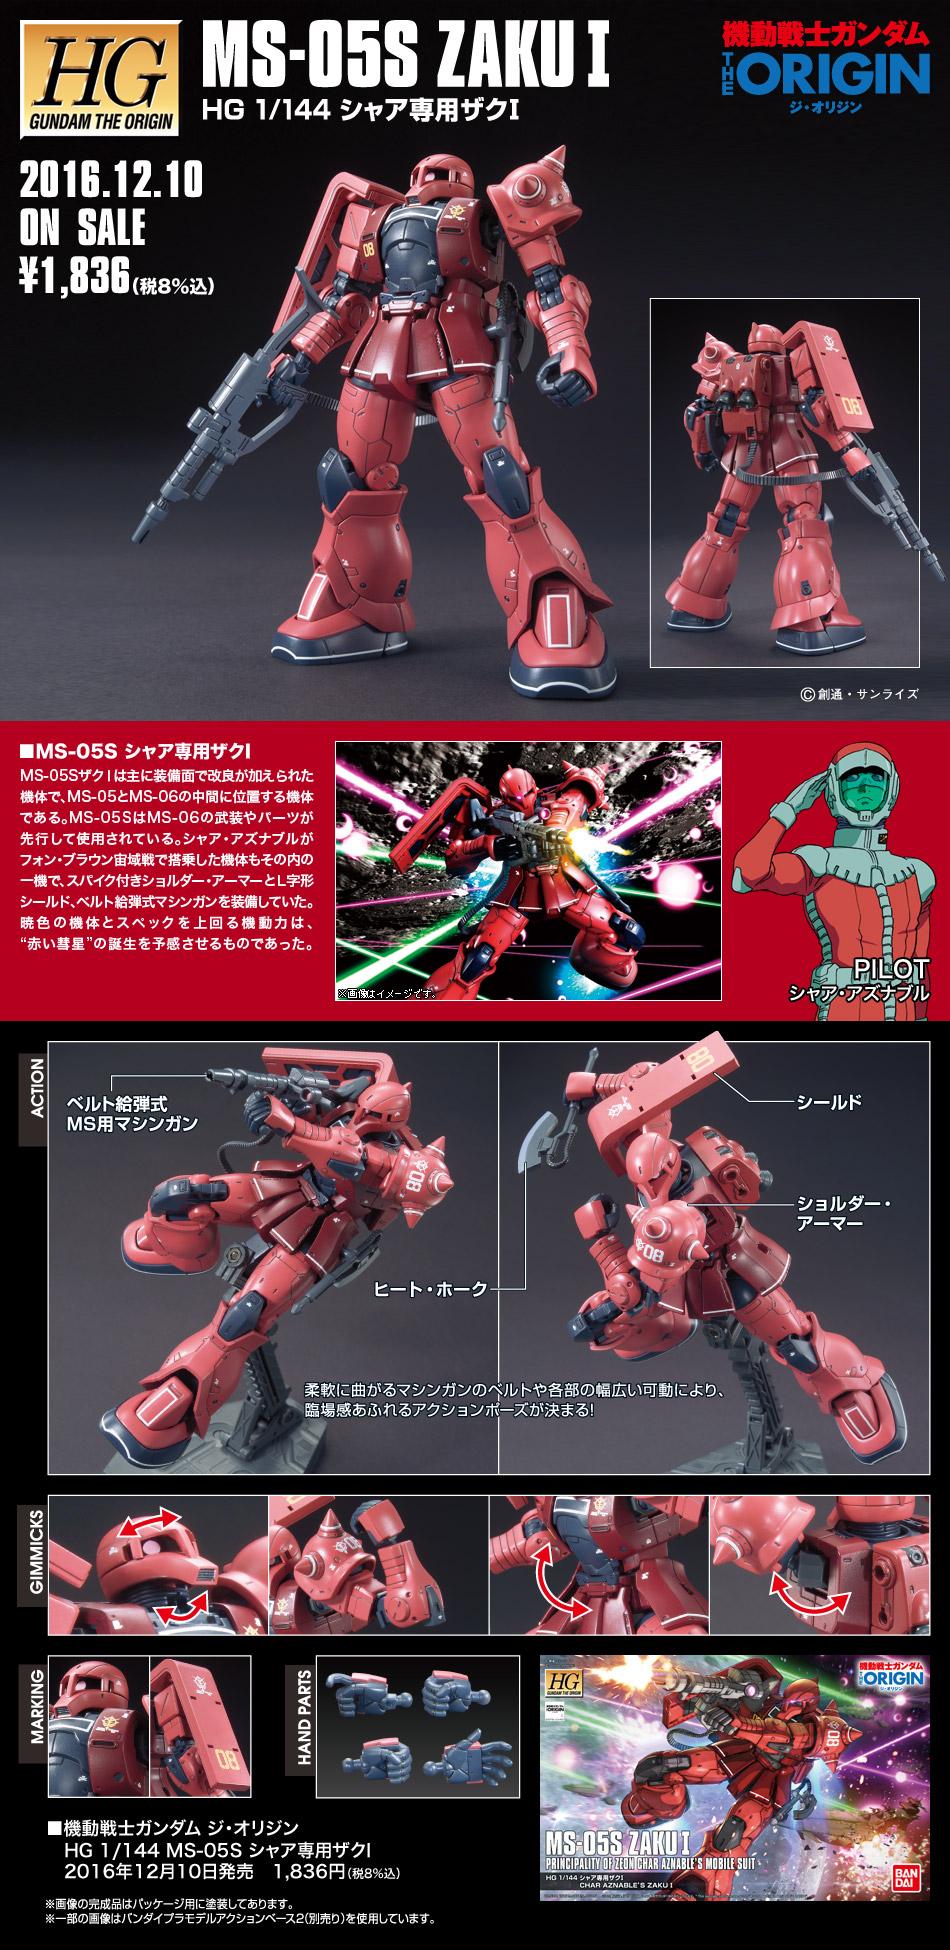 HG 1/144 MS-05S シャア専用ザクI 公式商品説明(画像)